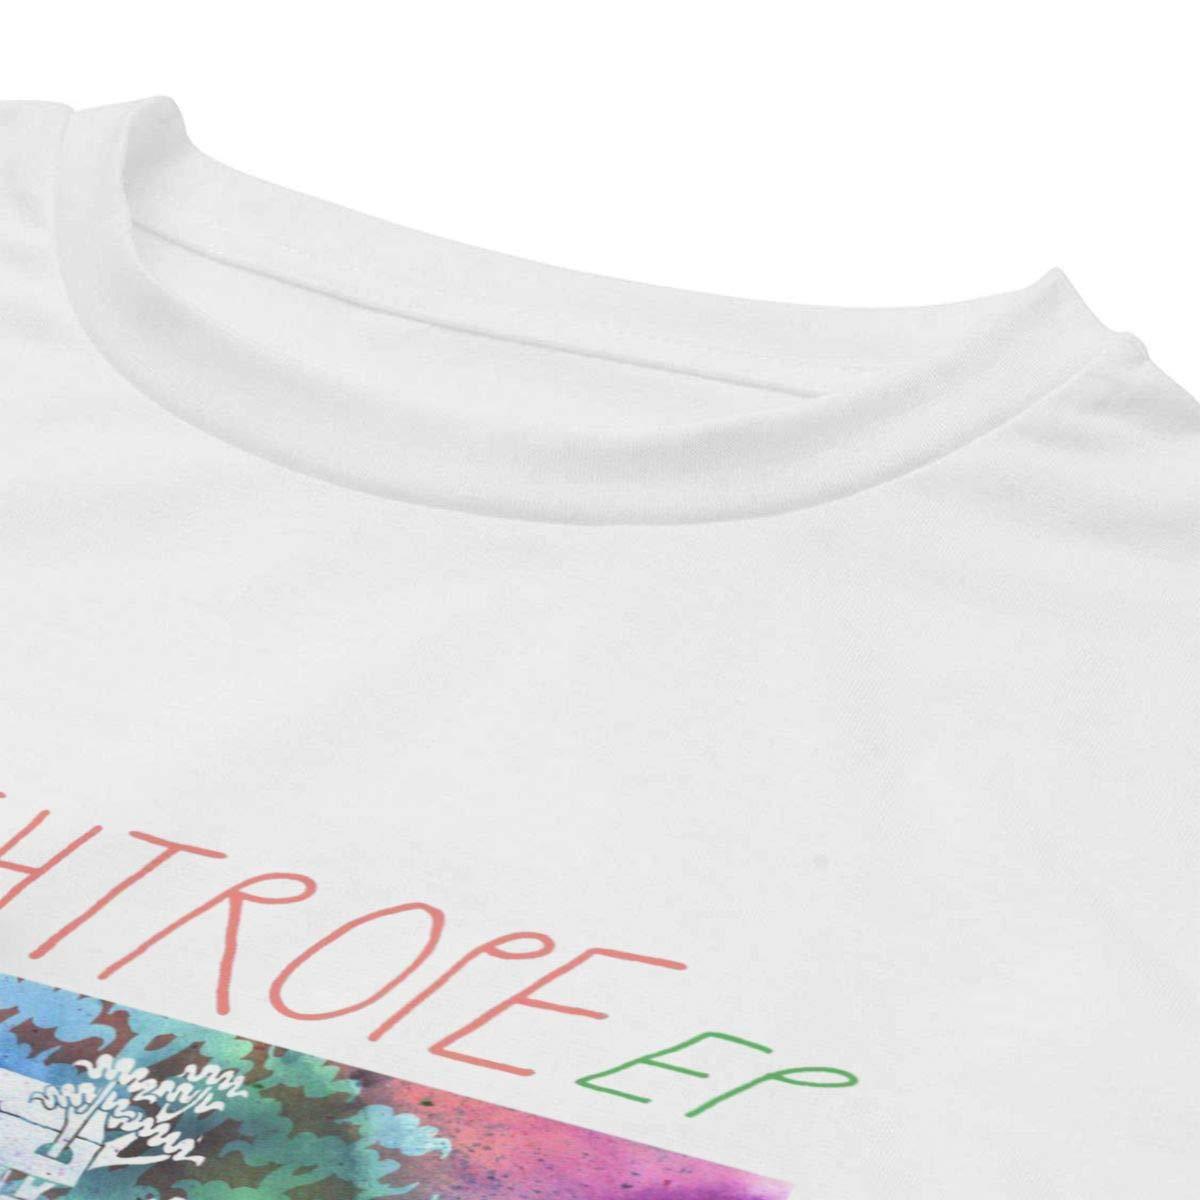 Yaruiguan Womens 100/% Cotton Shirt Tops Walk The Moon Design Crewneck Shirt Tops